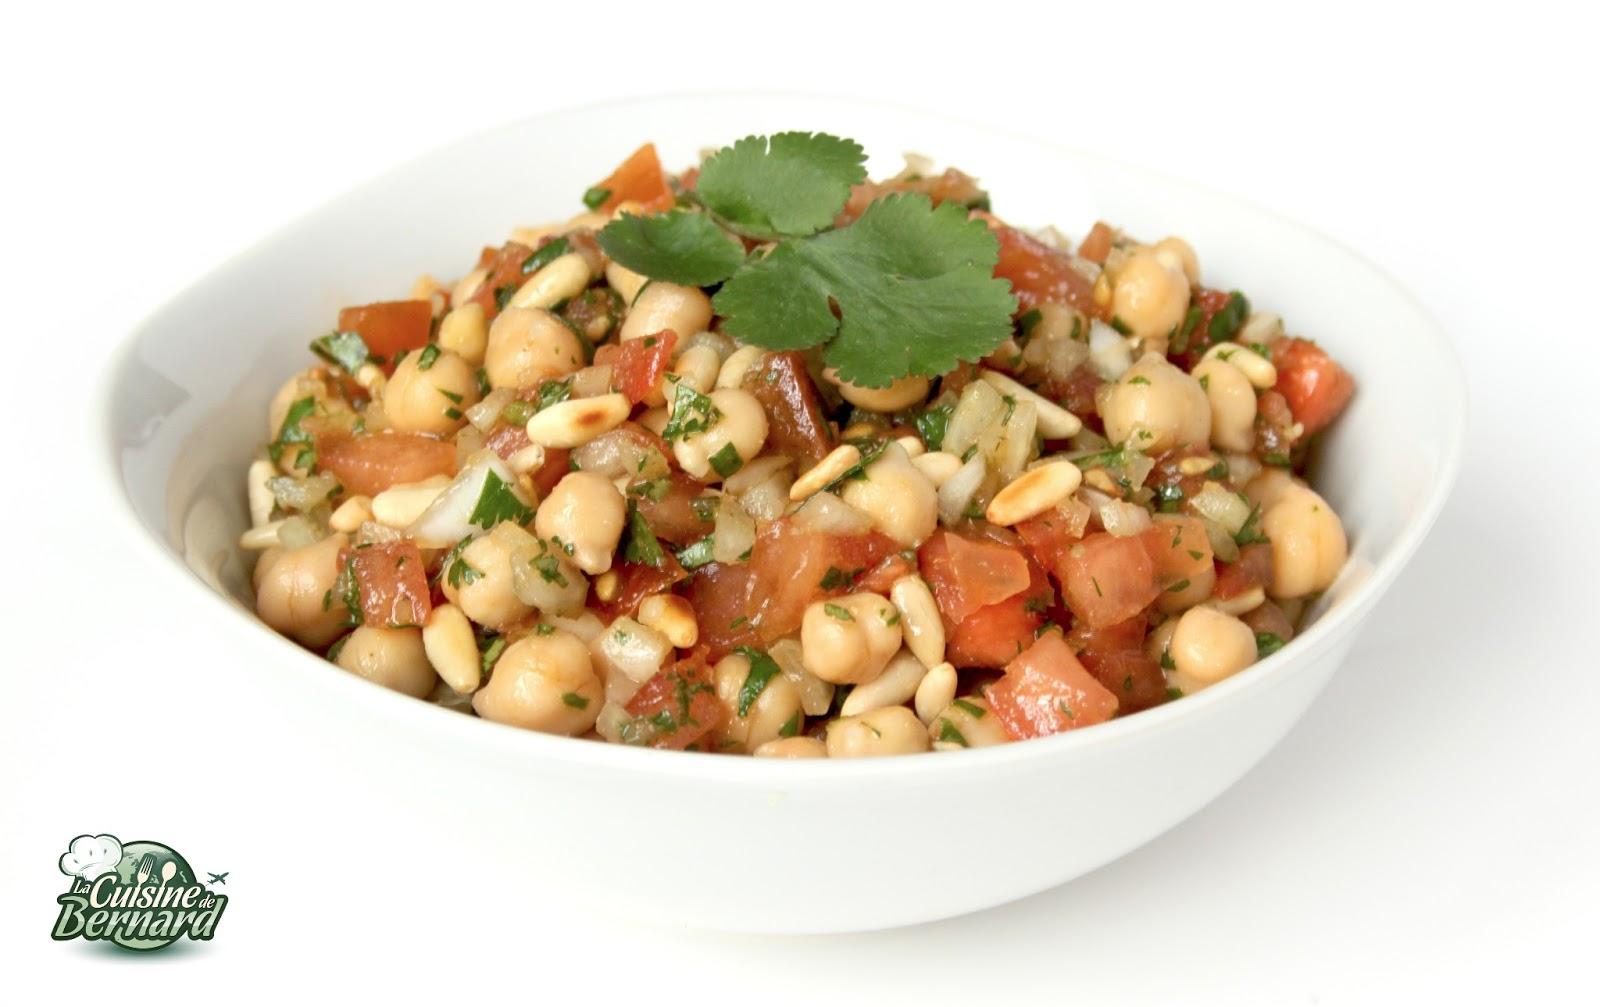 La cuisine de bernard salade de pois chiches for Cuisine de bernard